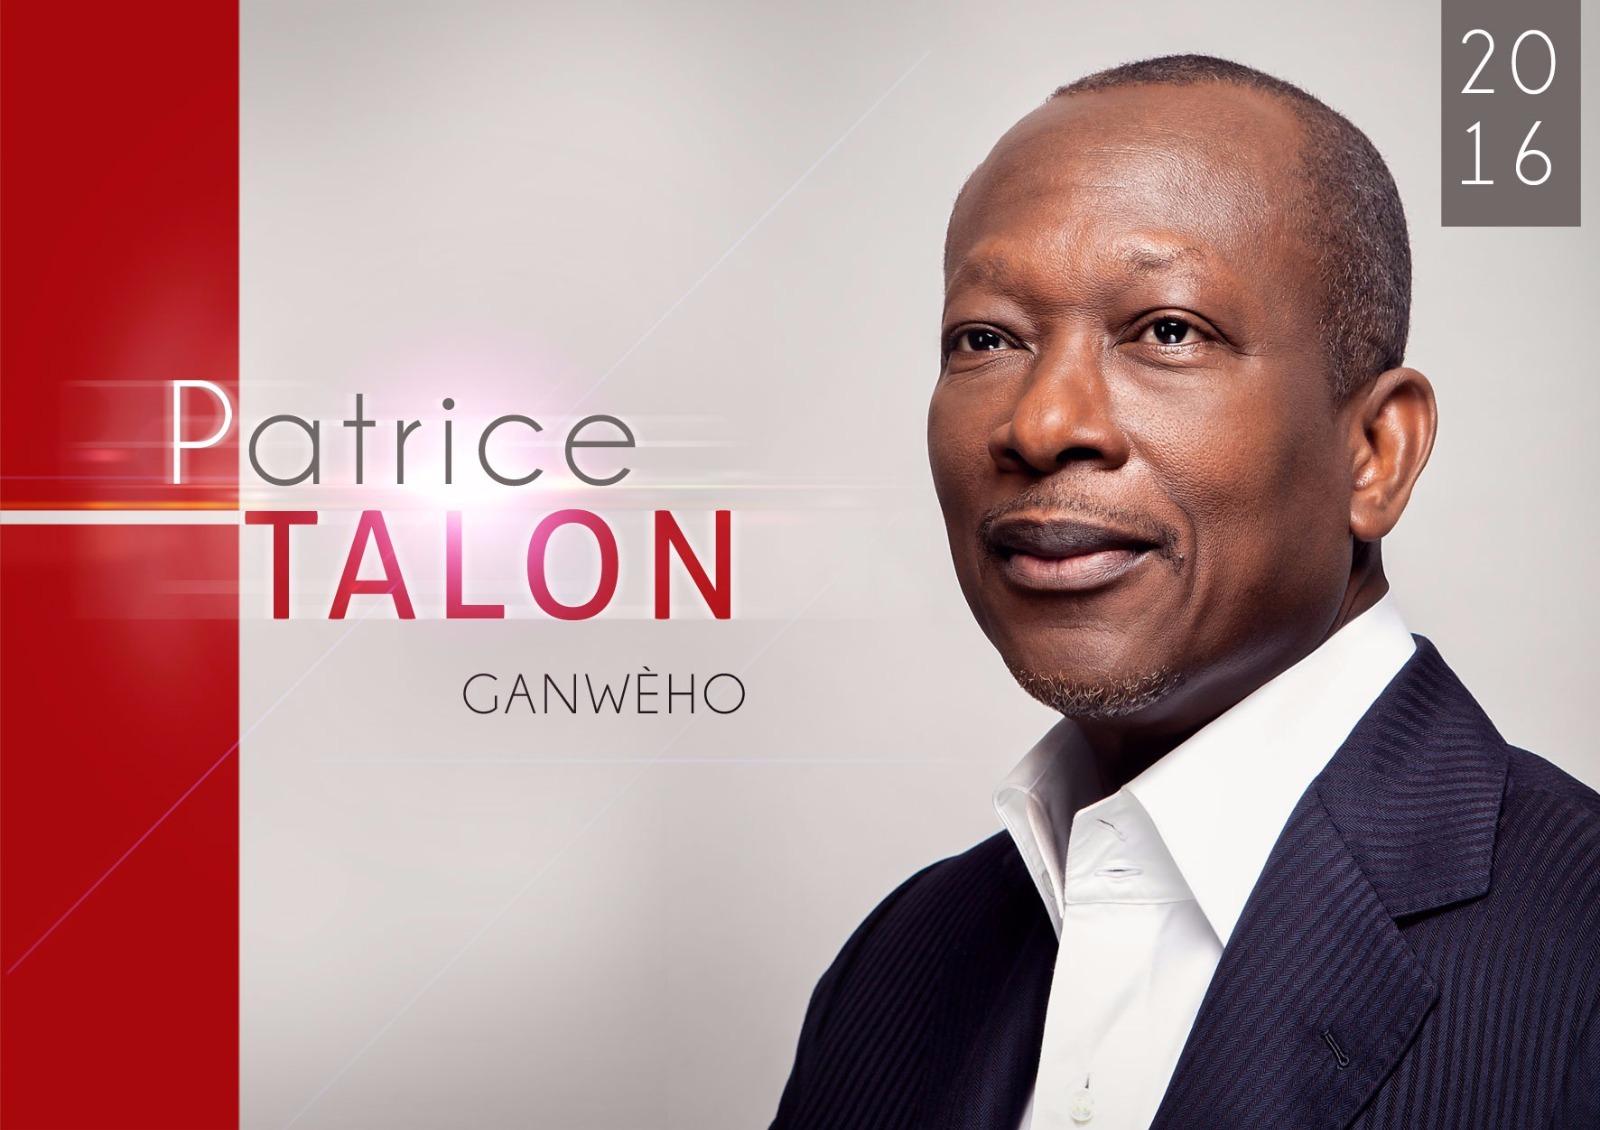 Patrice-TALON-new1